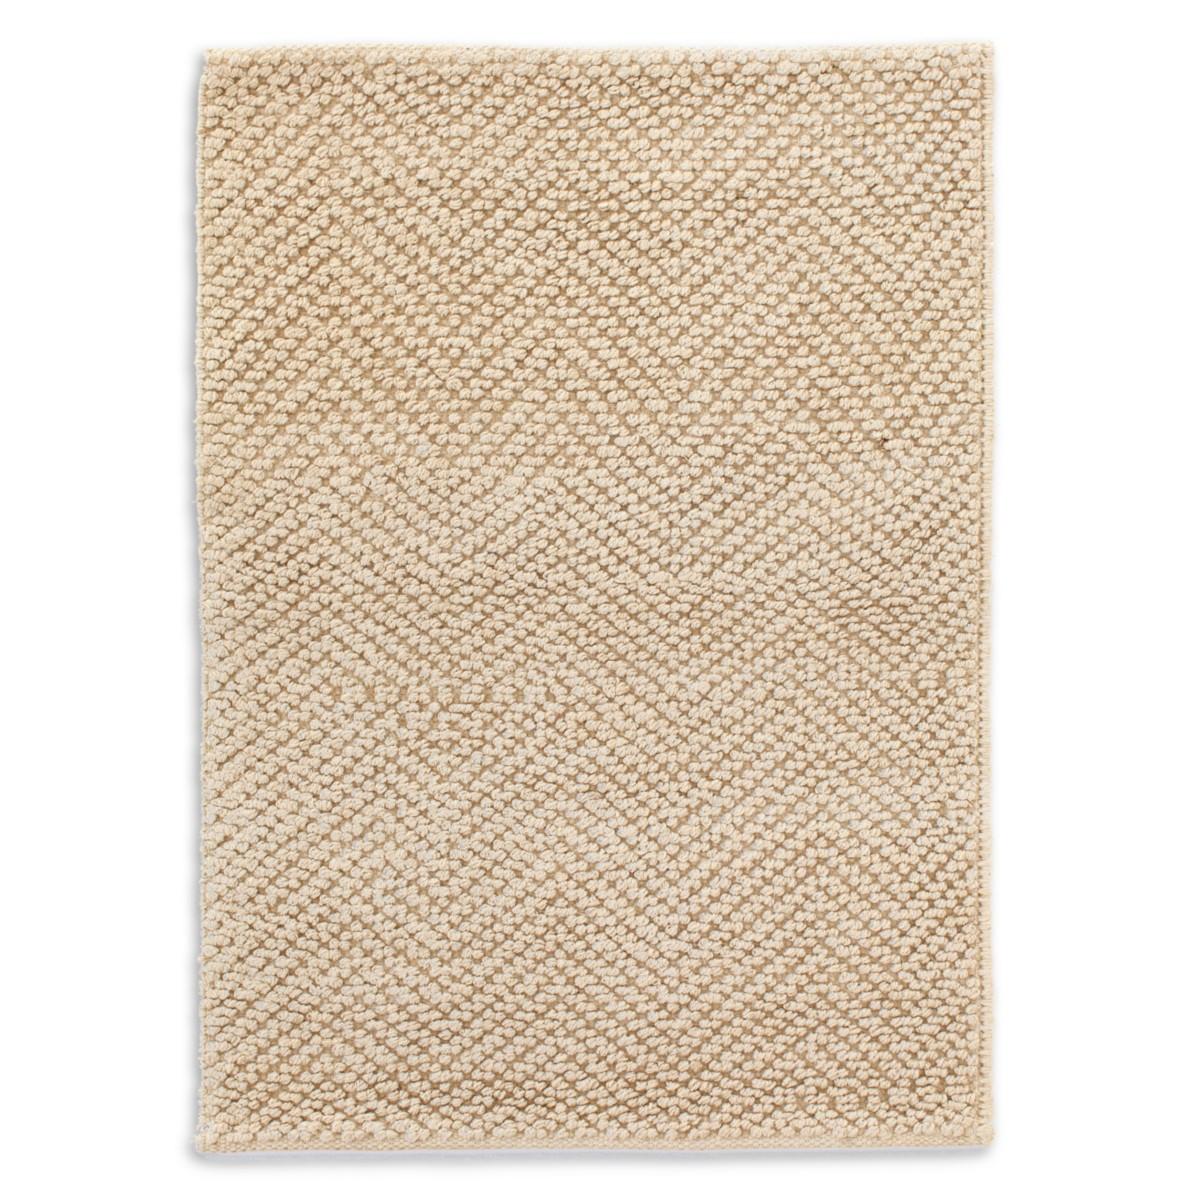 Nevis Jute Woven Rug - Sand